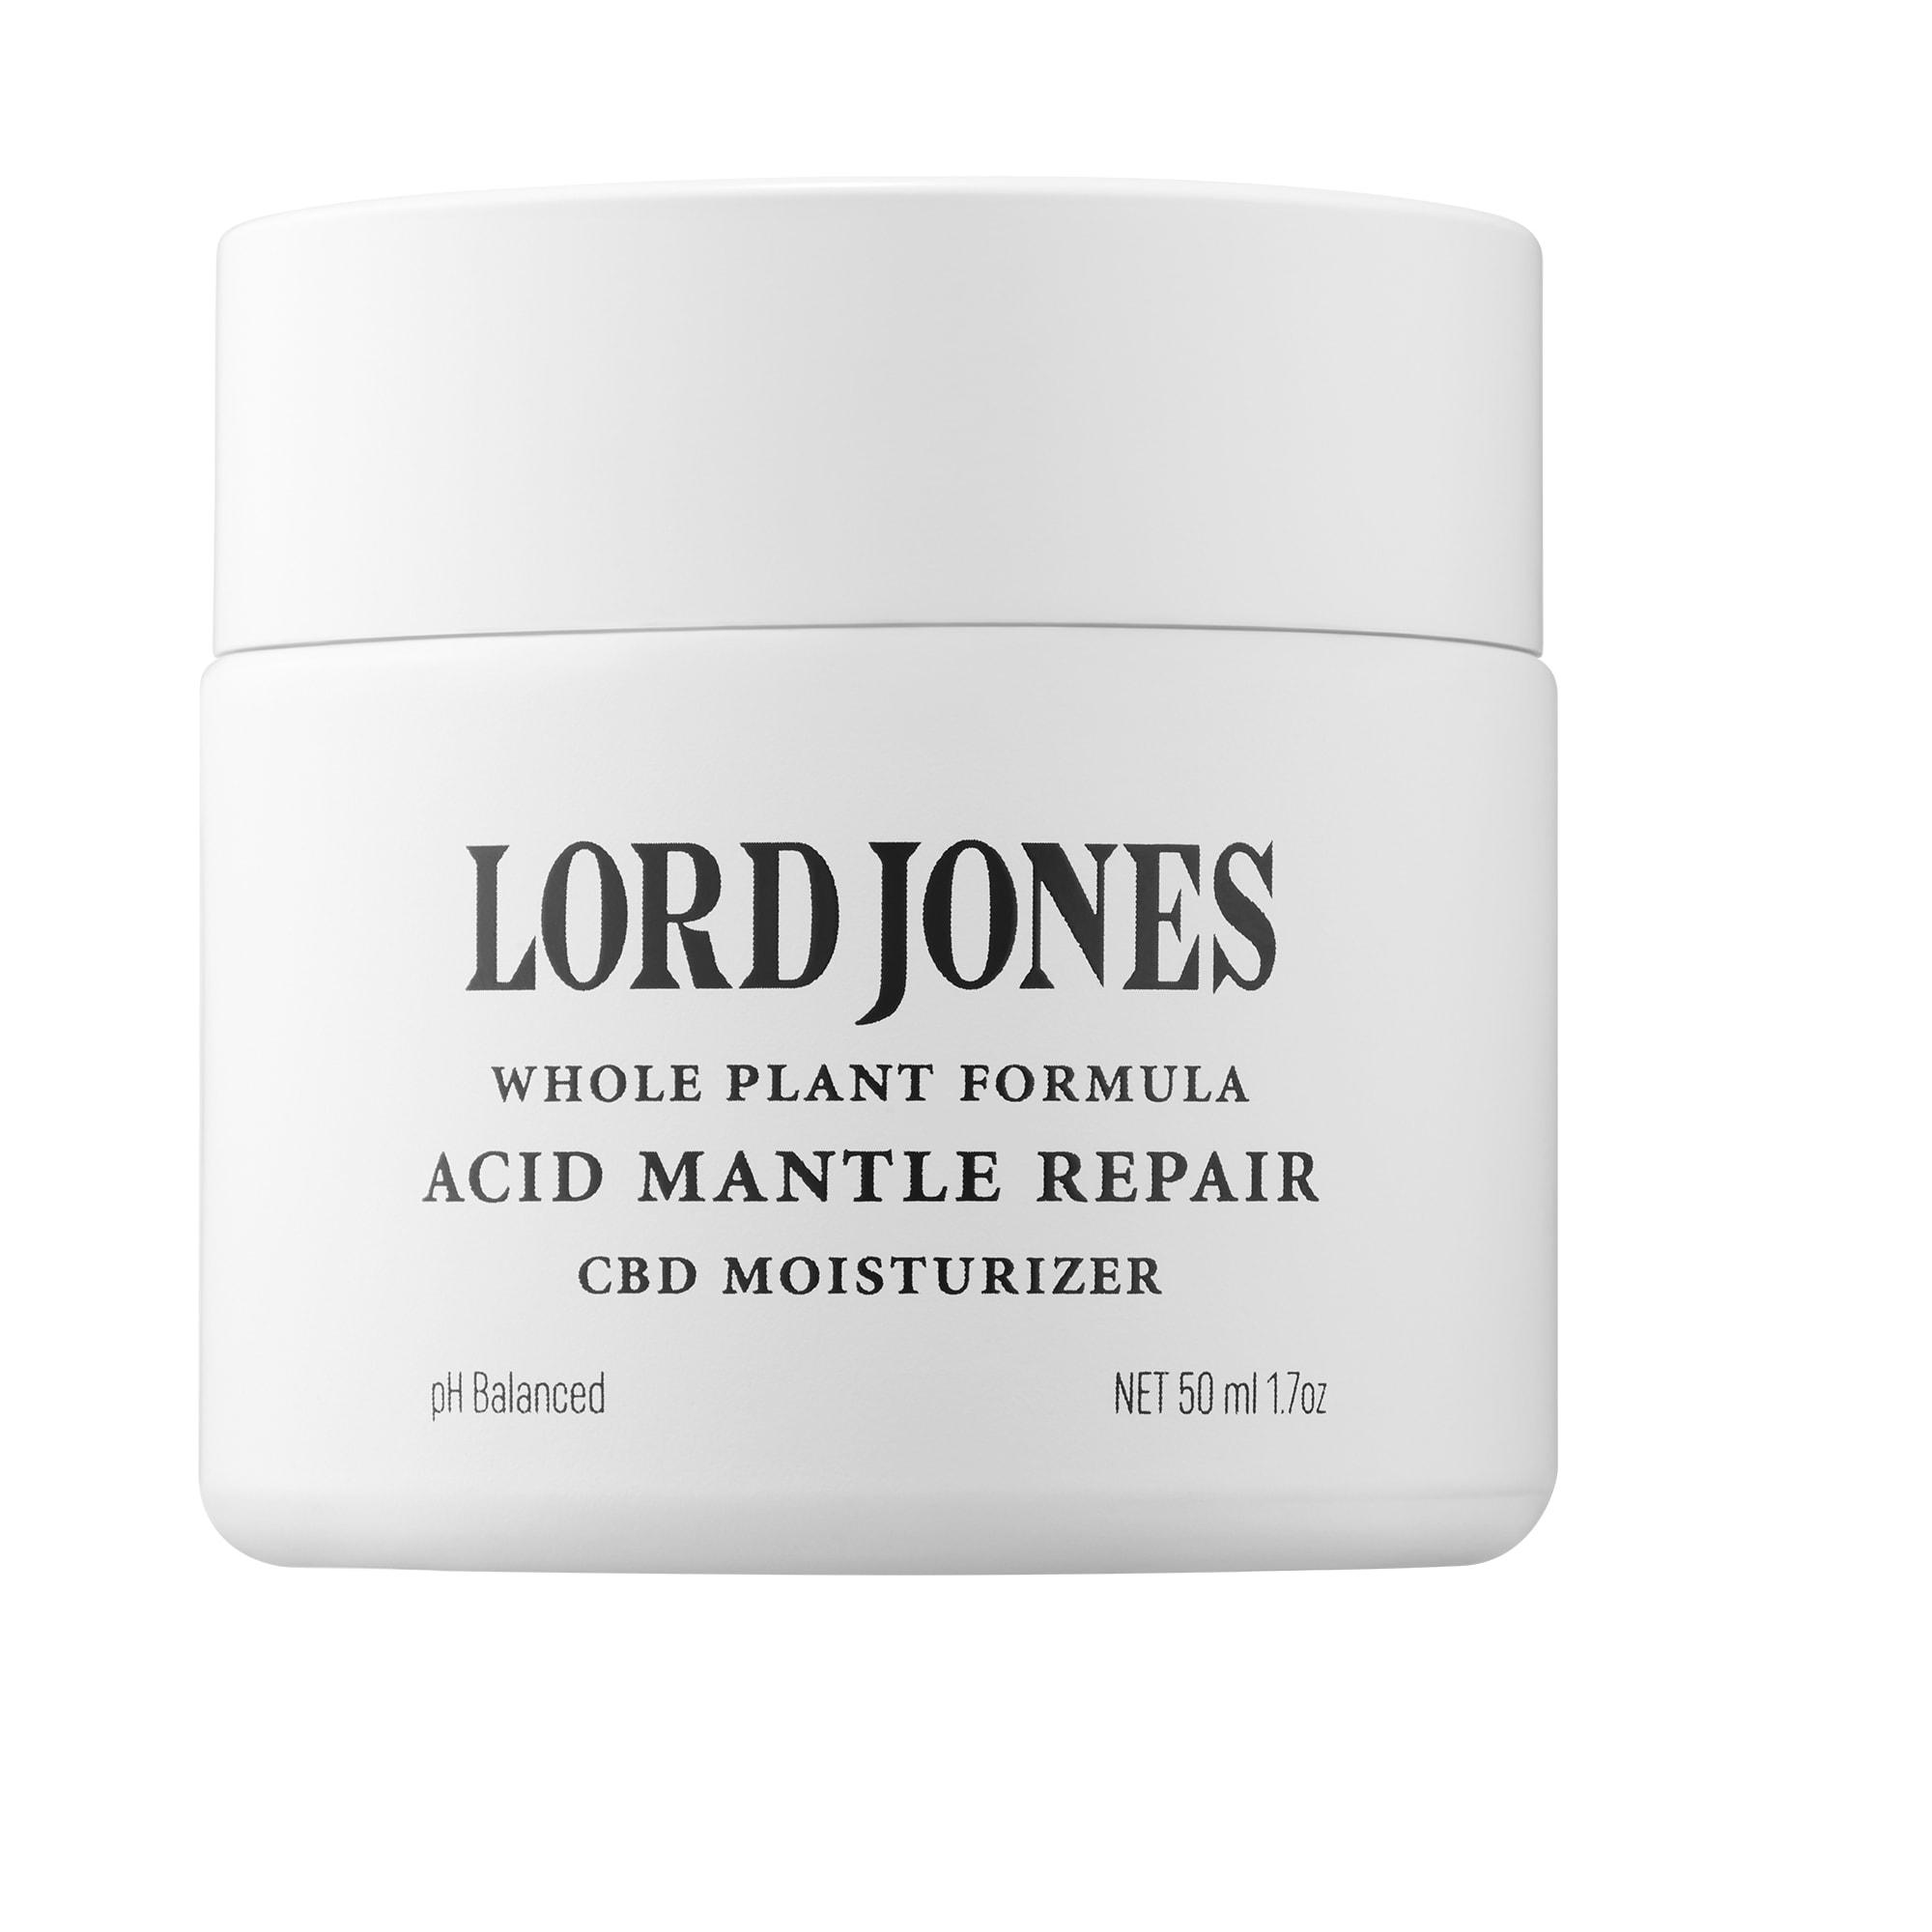 Lord Jones - Acid Mantle Repair Moisturizer With 250mg CBD and Ceramides